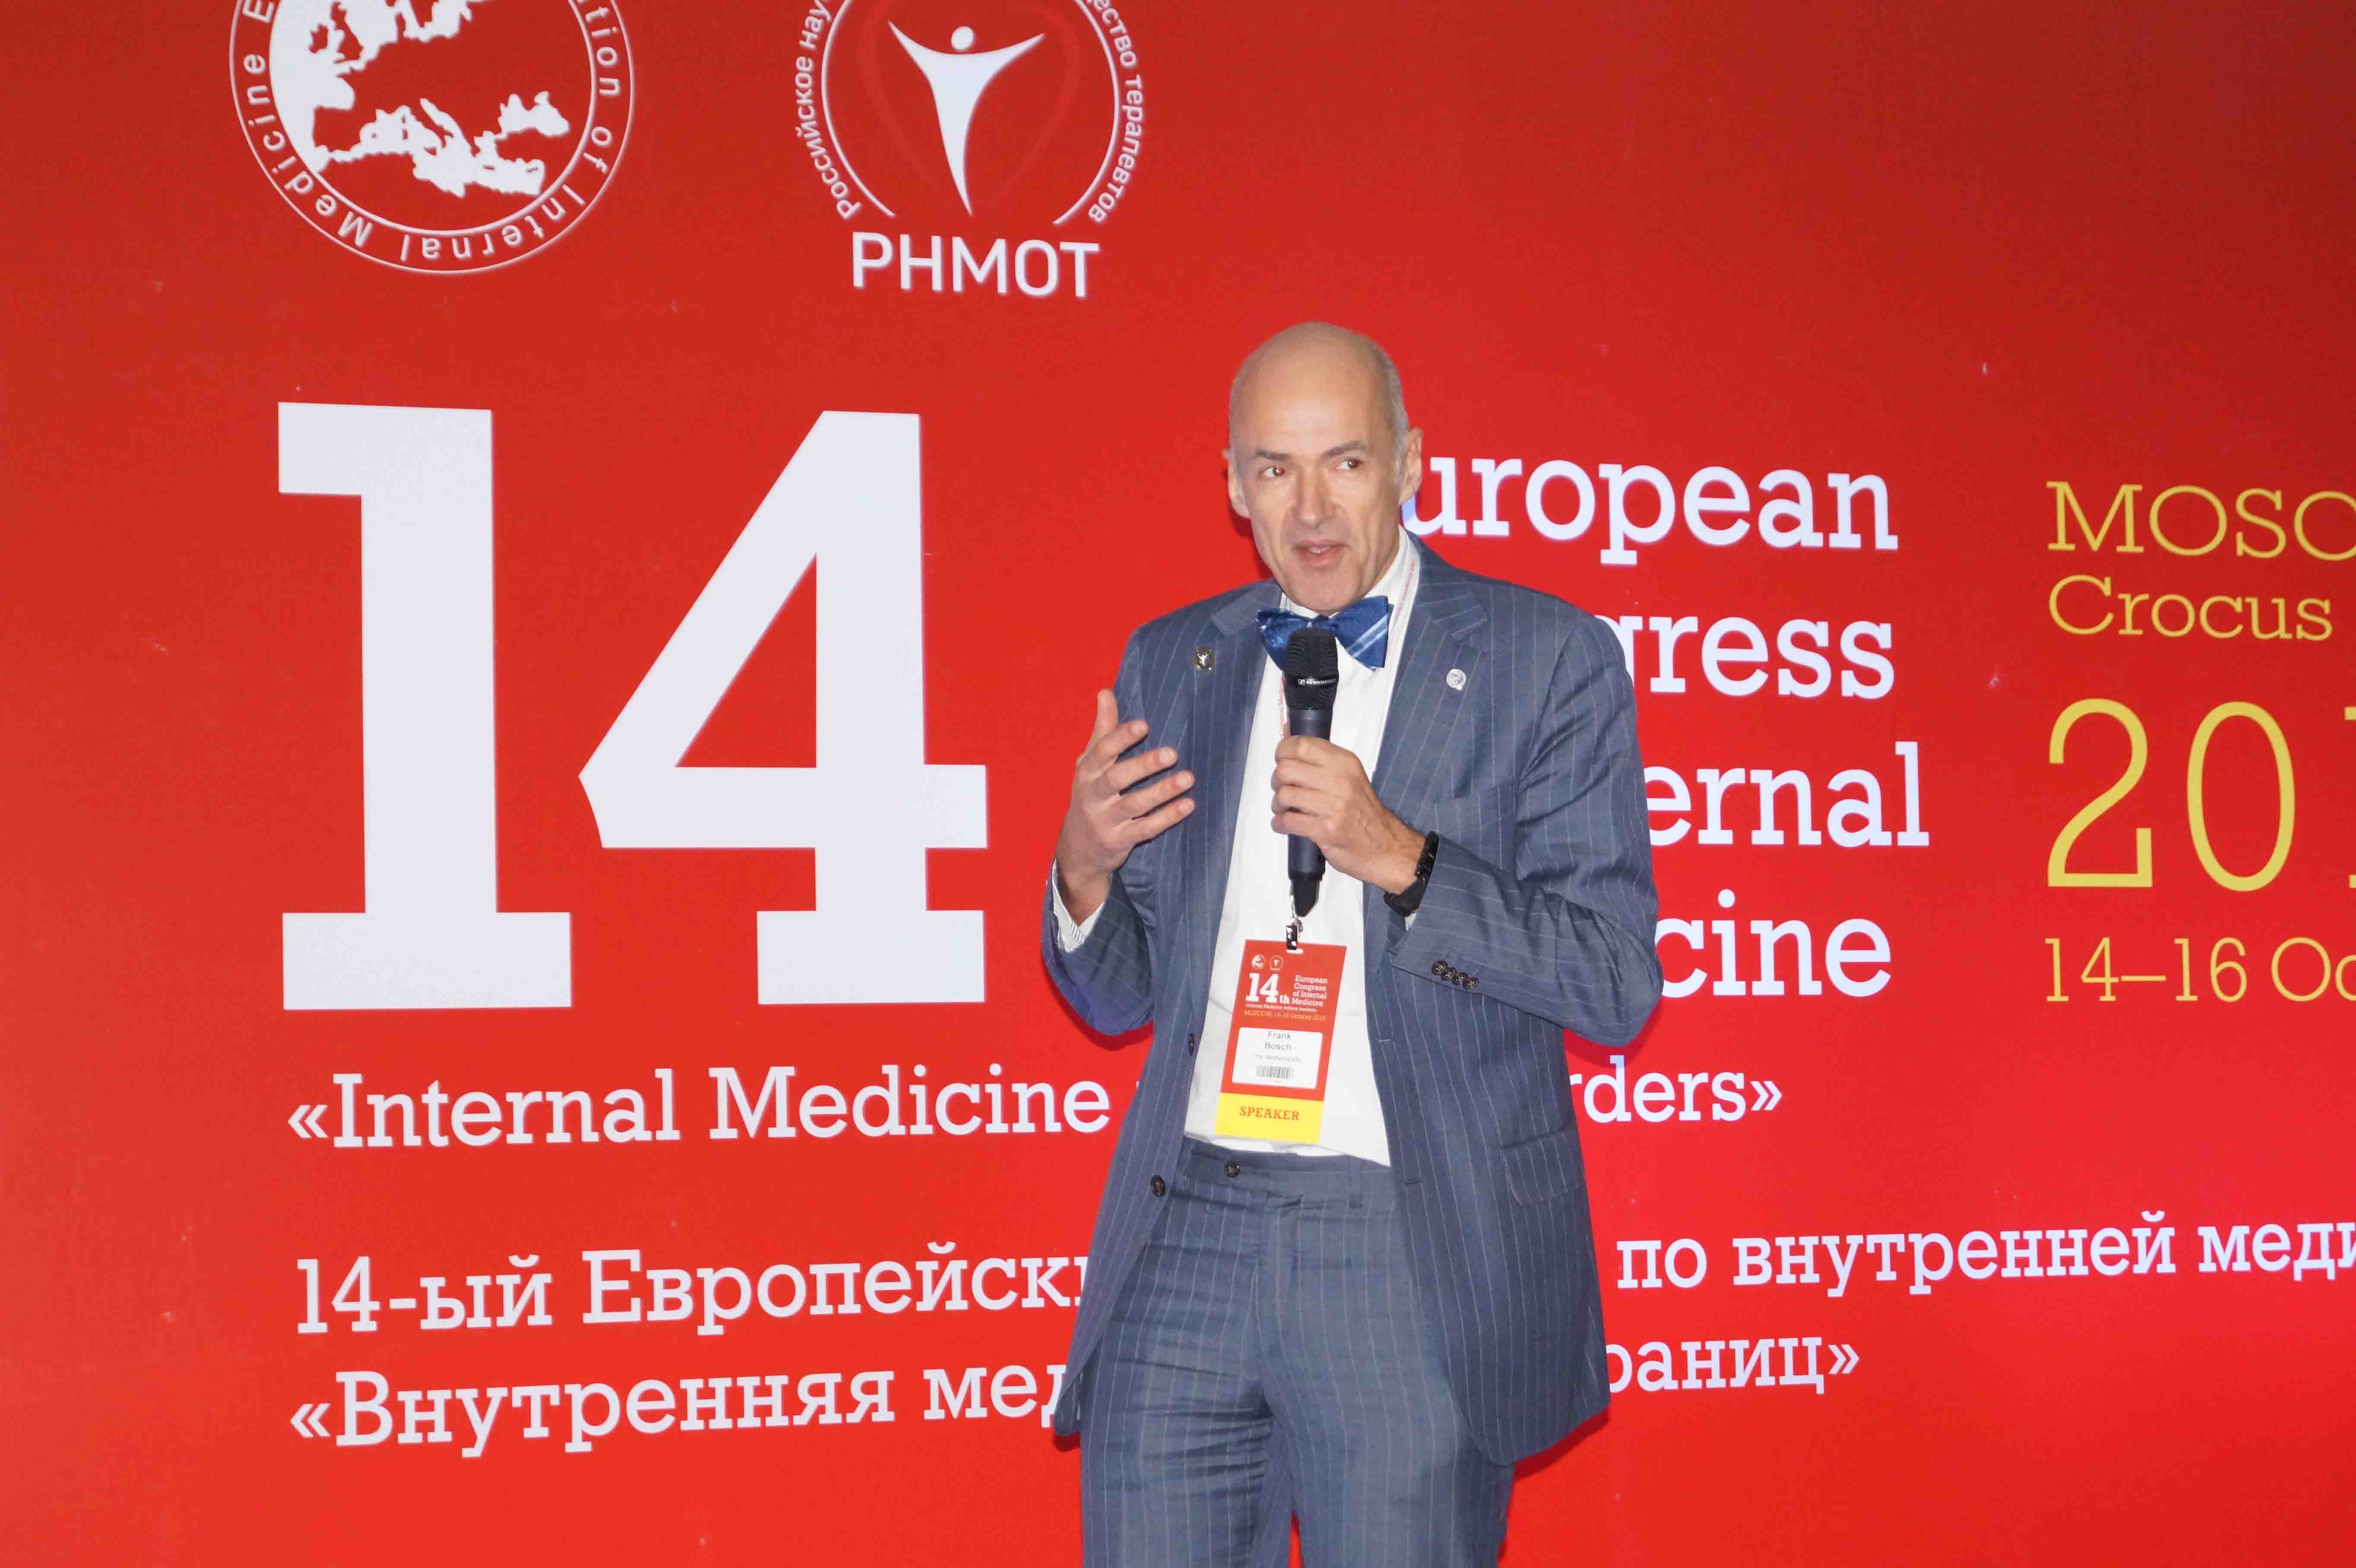 http://medicalexpress.ru/uploads/reportss/00002.jpg